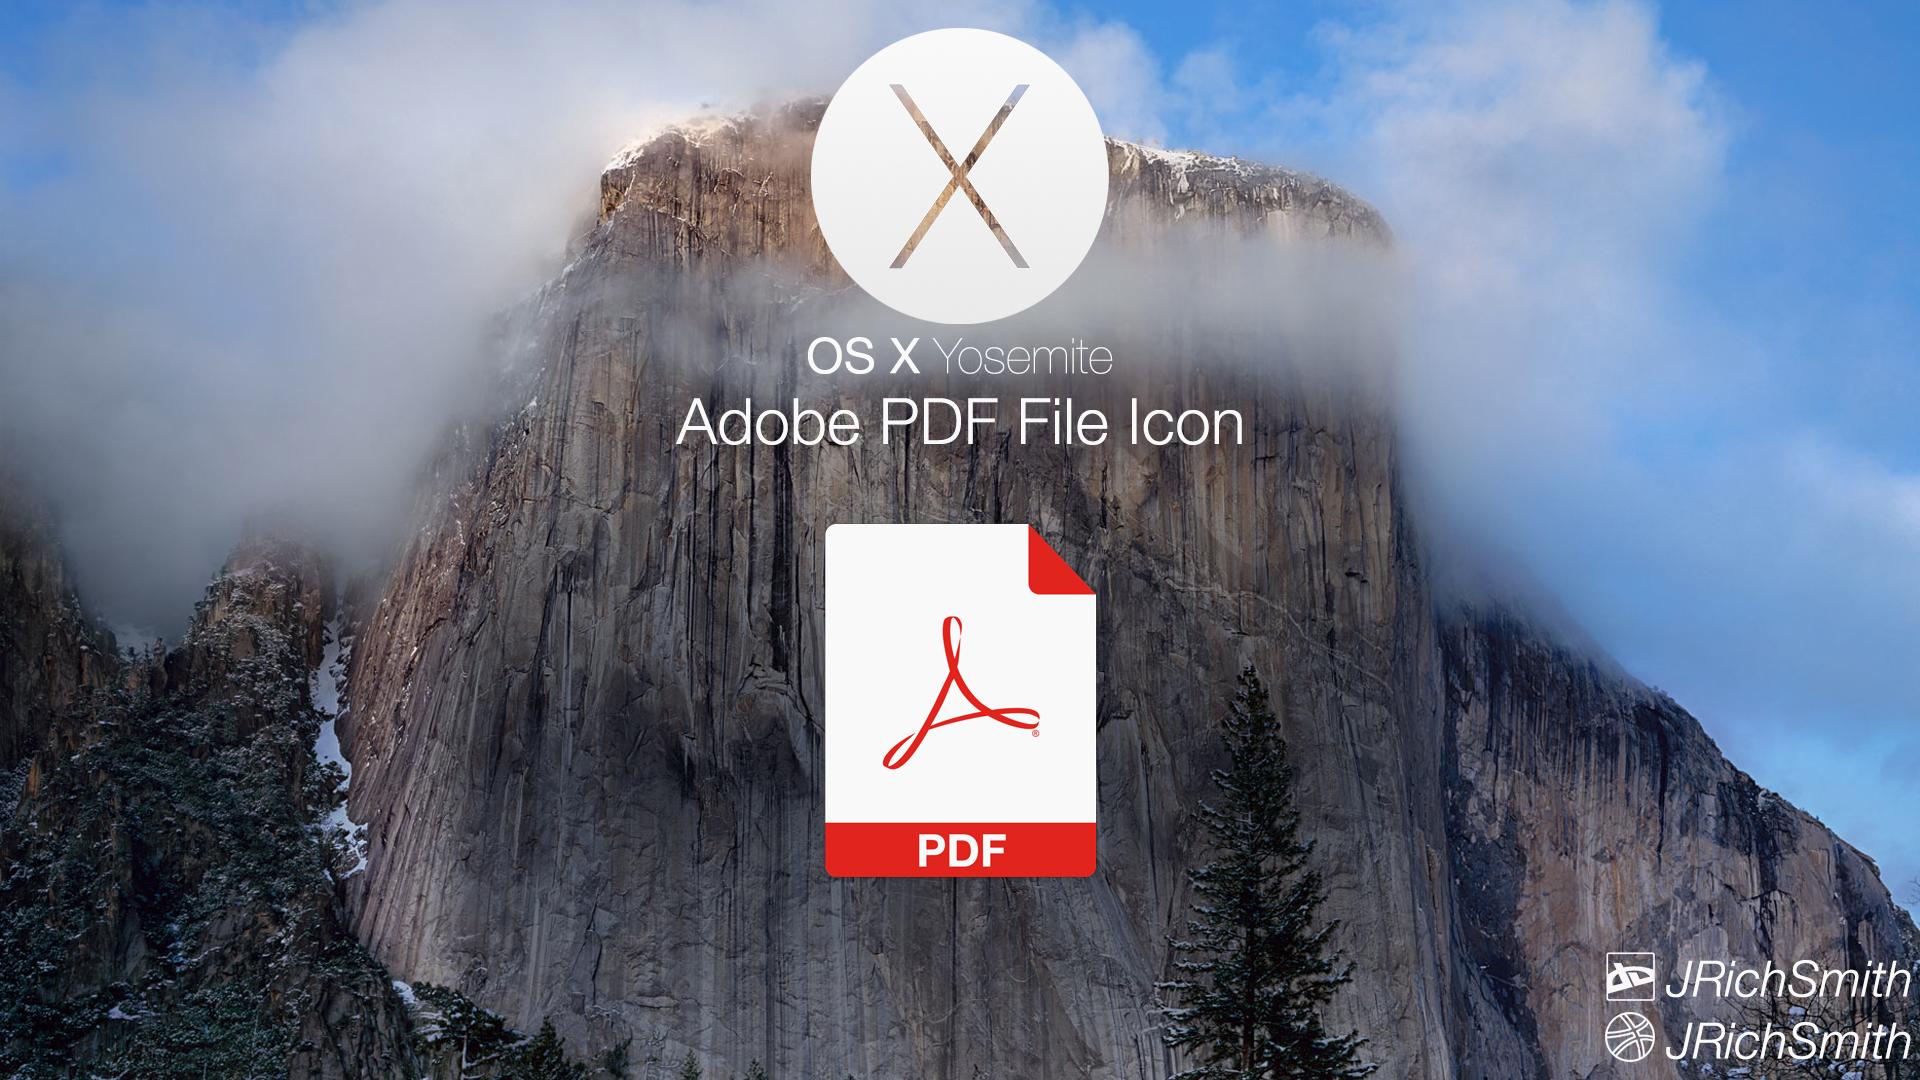 OS X Yosemite - PDF File Icon